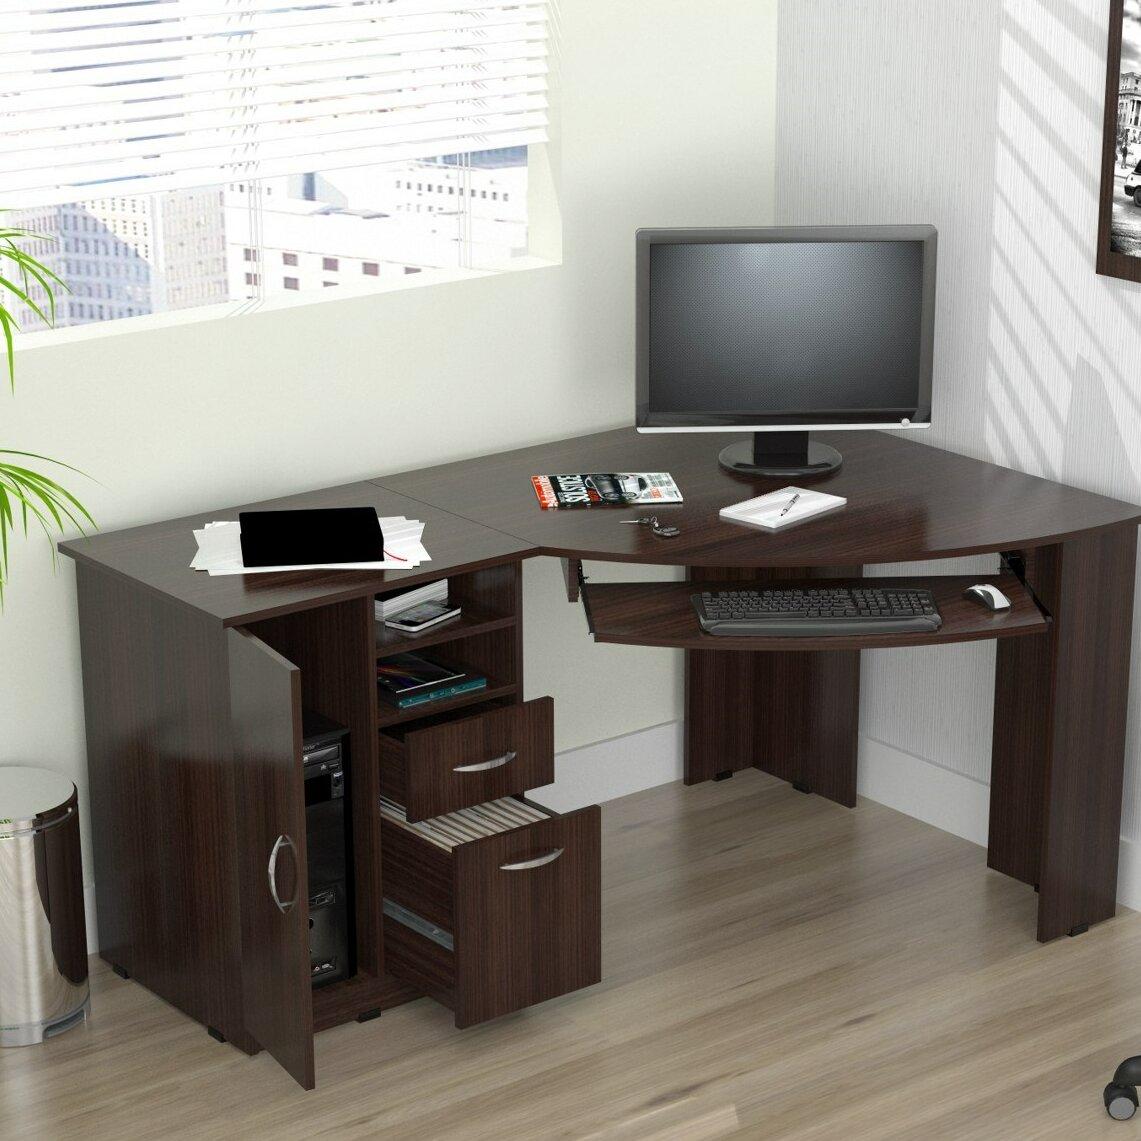 inval computer desk with shelf reviews wayfair. Black Bedroom Furniture Sets. Home Design Ideas